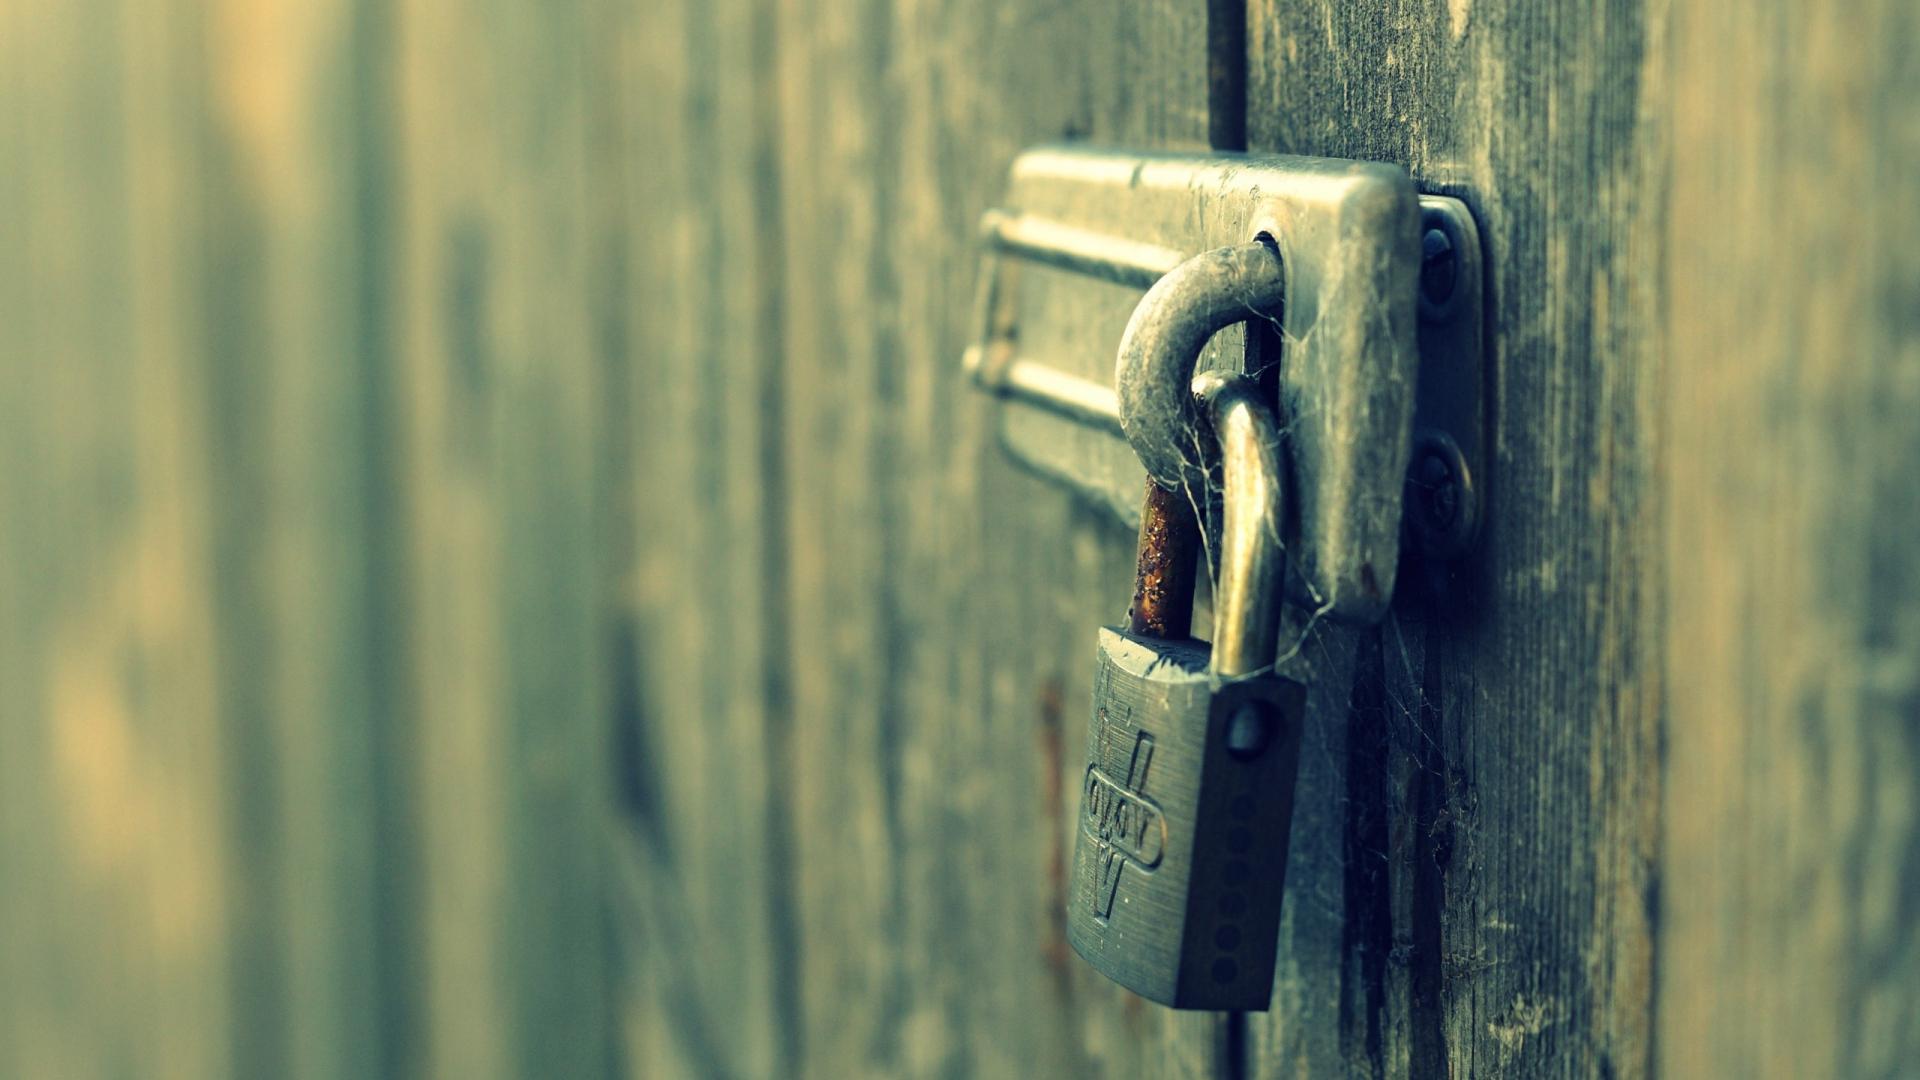 door lock closed & Download Wallpaper 1920x1080 door lock closed Full HD 1080p HD ...